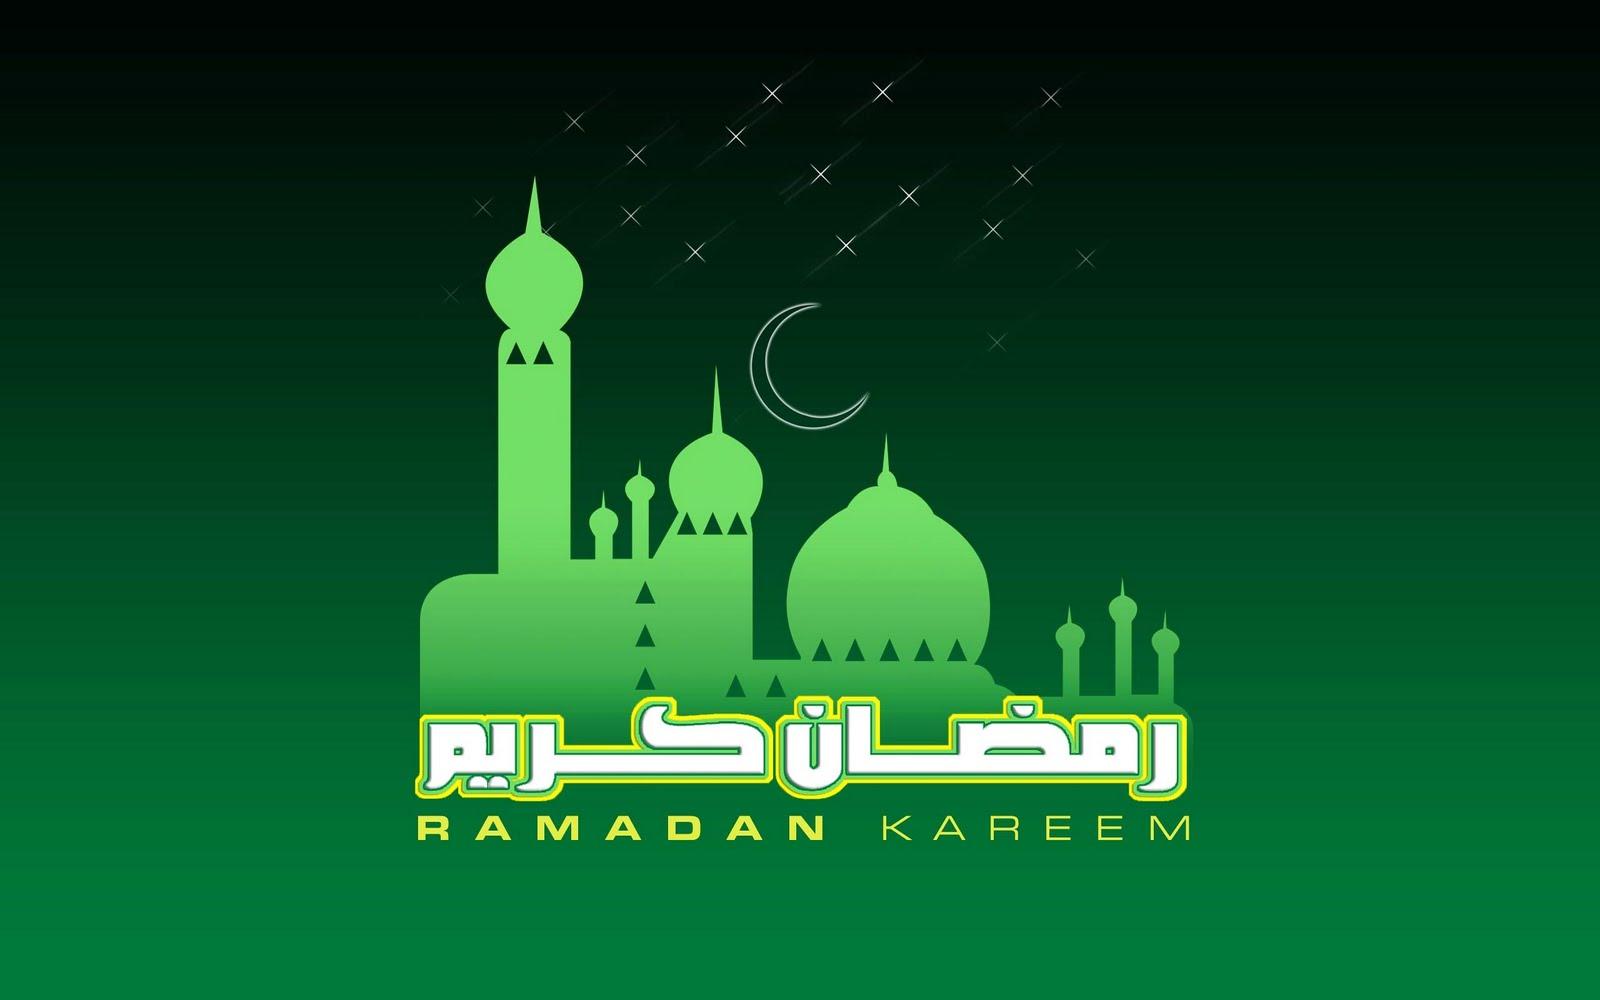 http://4.bp.blogspot.com/-MUvhf2Y2YDY/Tja8UtvRrnI/AAAAAAAAA1Y/jCisRYZBn40/s1600/Ramadan-Mubarak-Wallpaper2.jpg